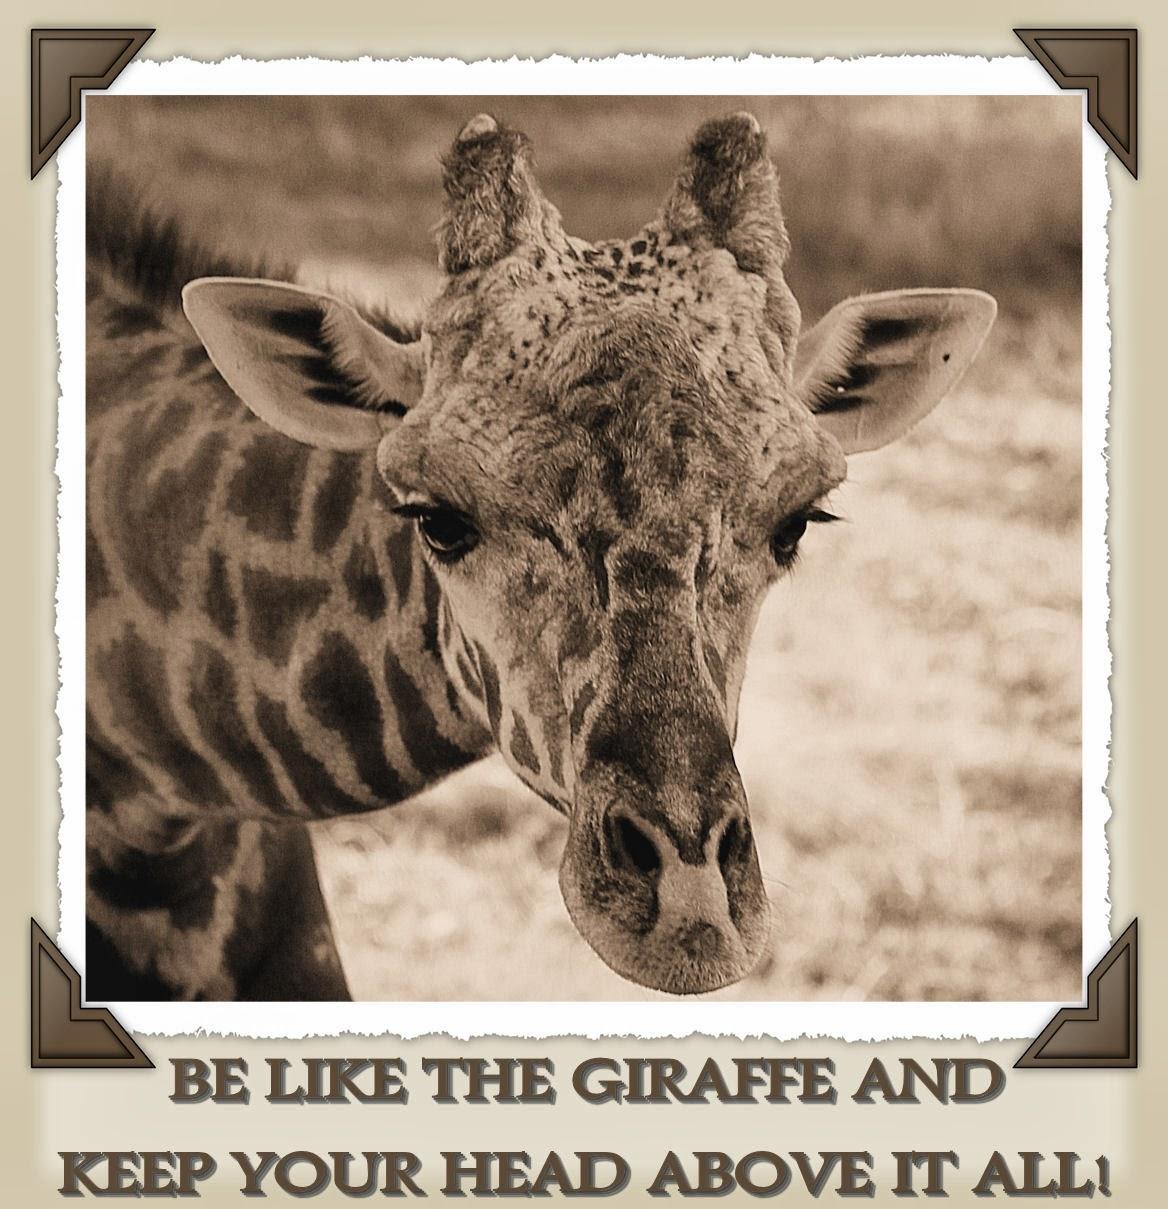 Giraffe Quotes Funny: Giraffe Love Quotes. QuotesGram